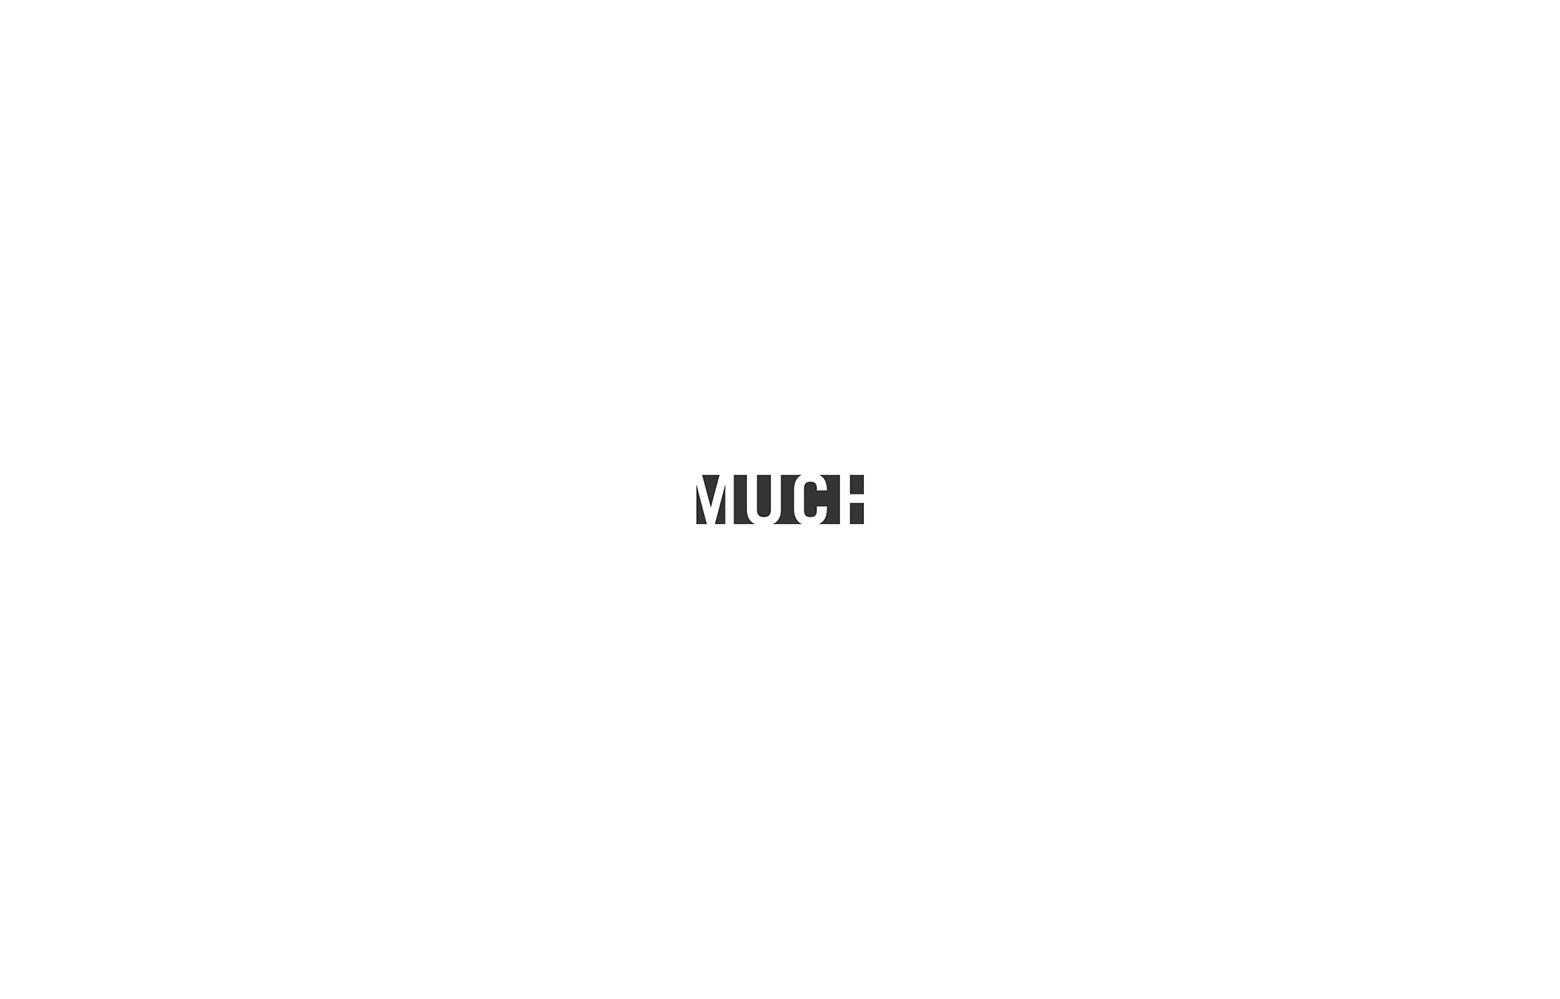 muchlogo copy.jpg